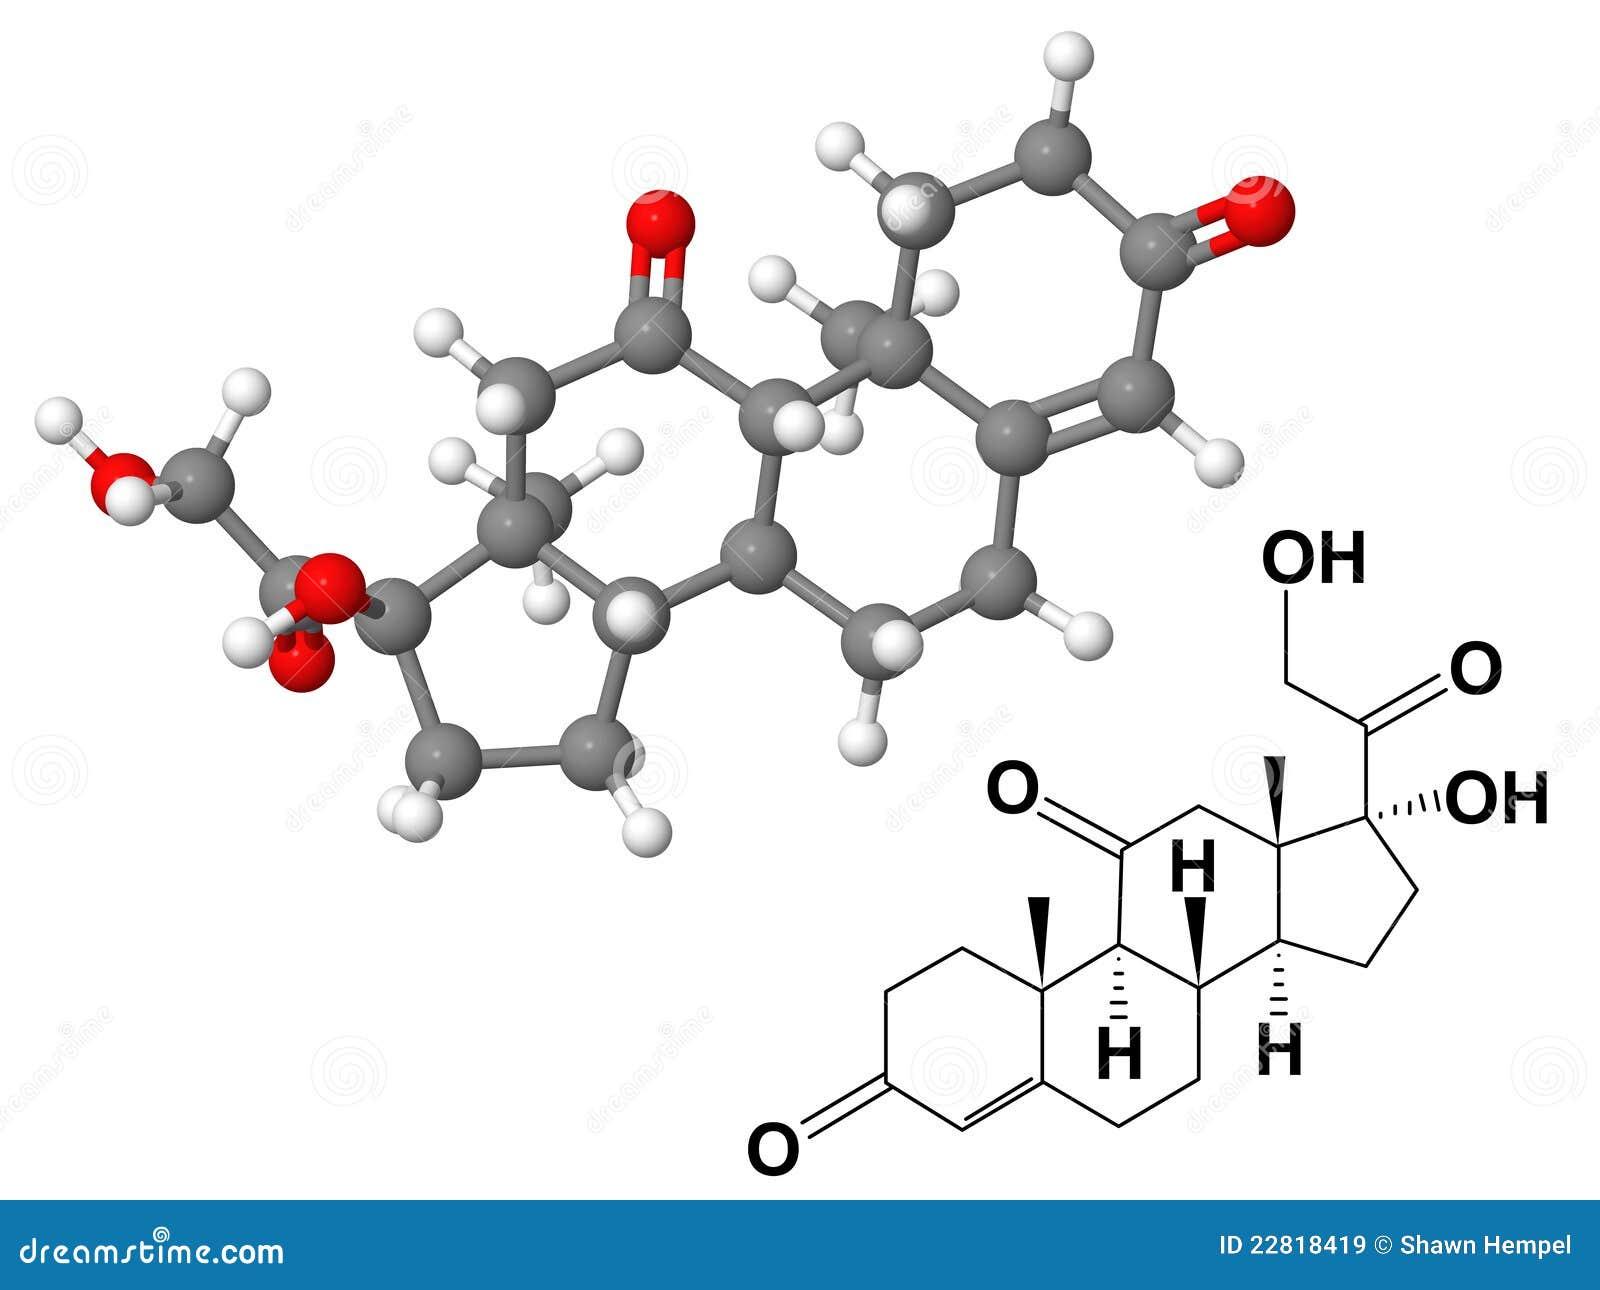 cortisone steroid withdrawal